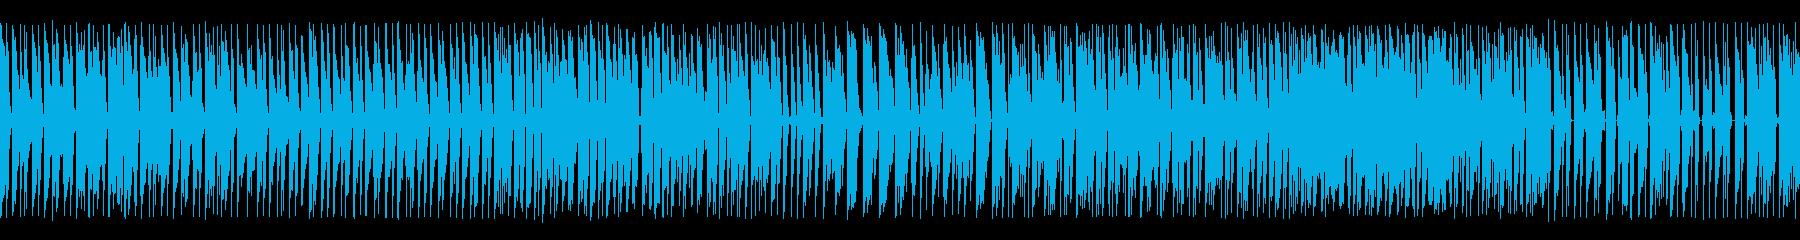 BGM014-05 ファミコンサウンド…の再生済みの波形